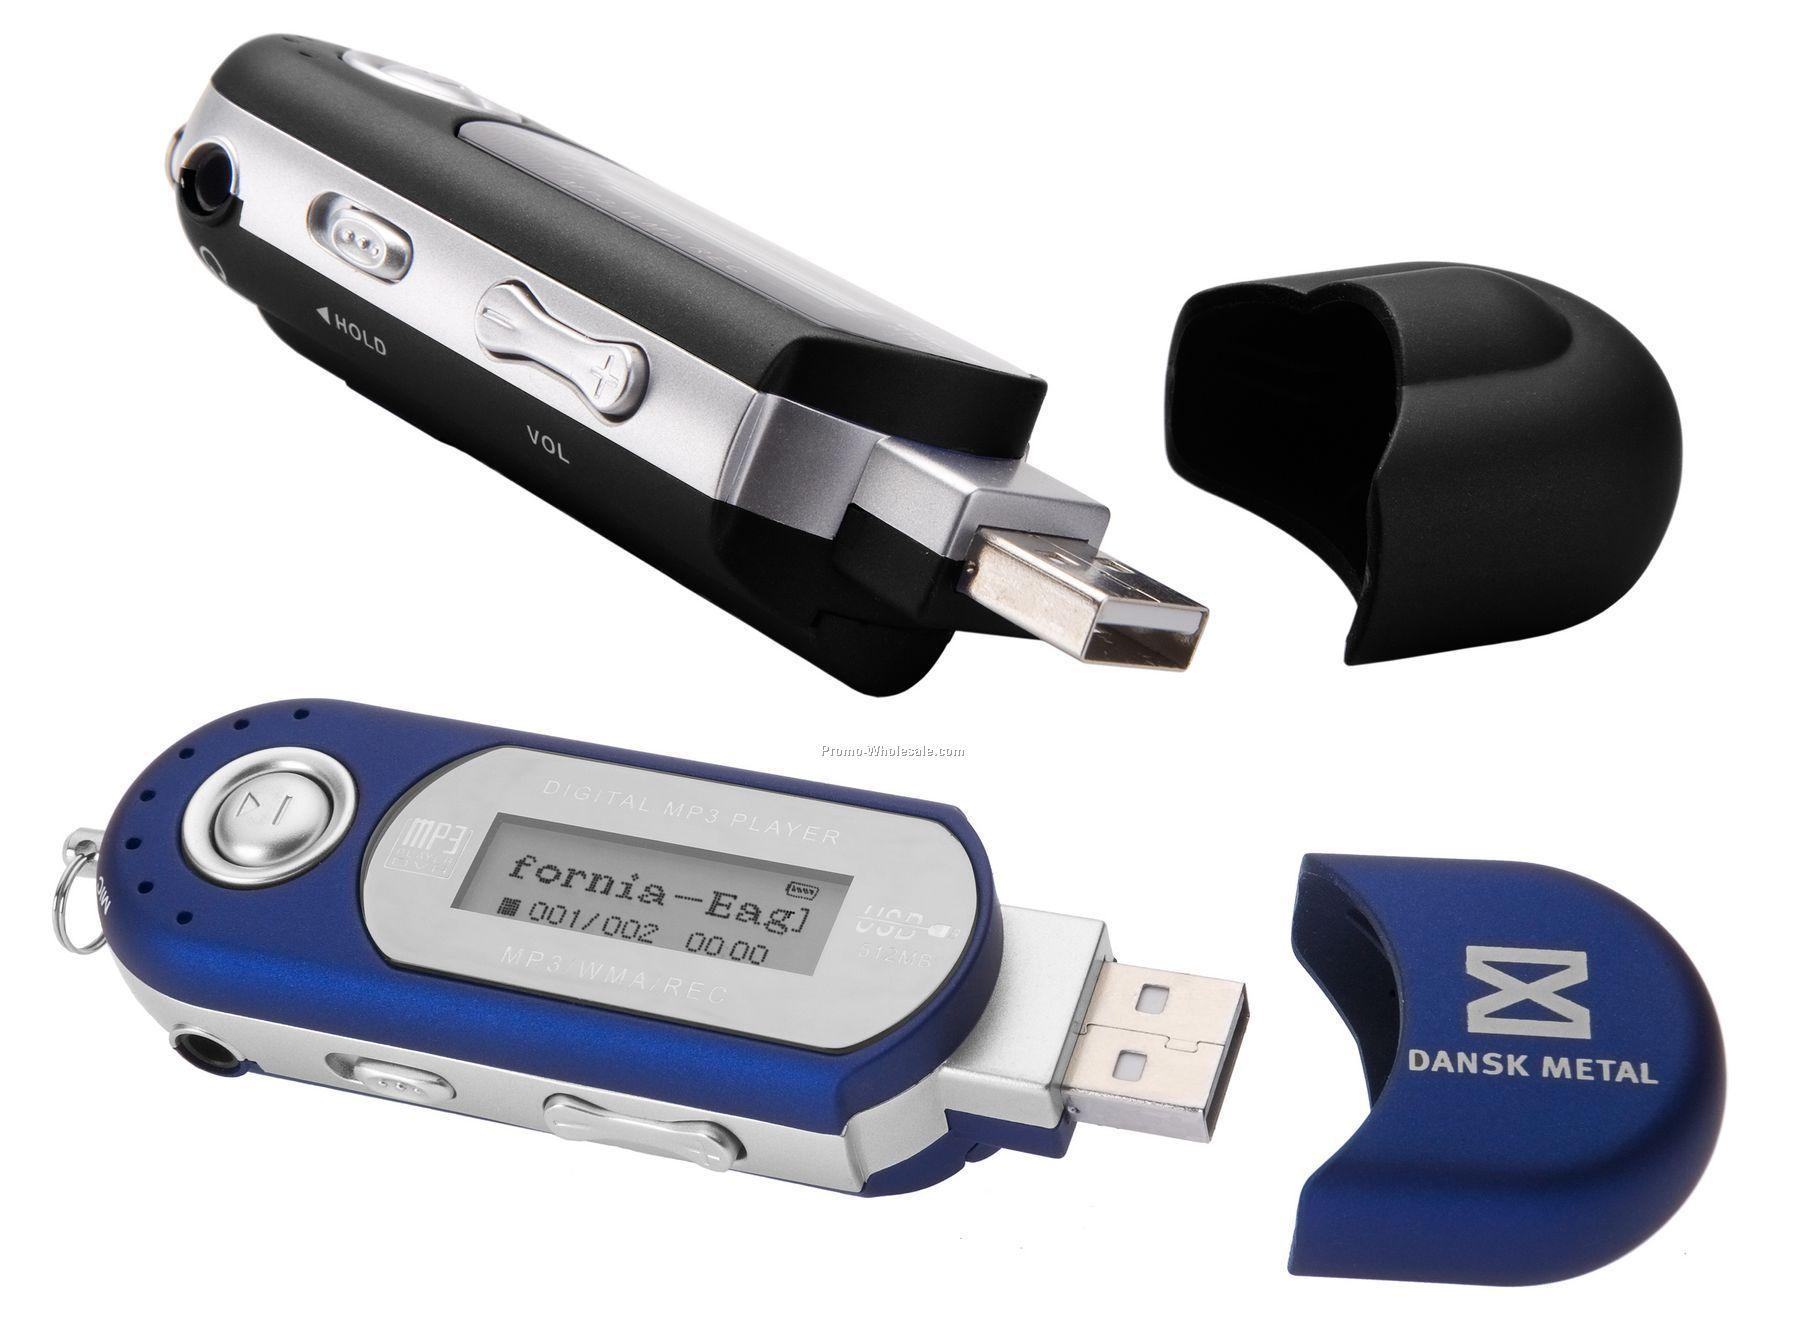 Limbo Mp3 Player & USB Flash Drive - 2 Gb